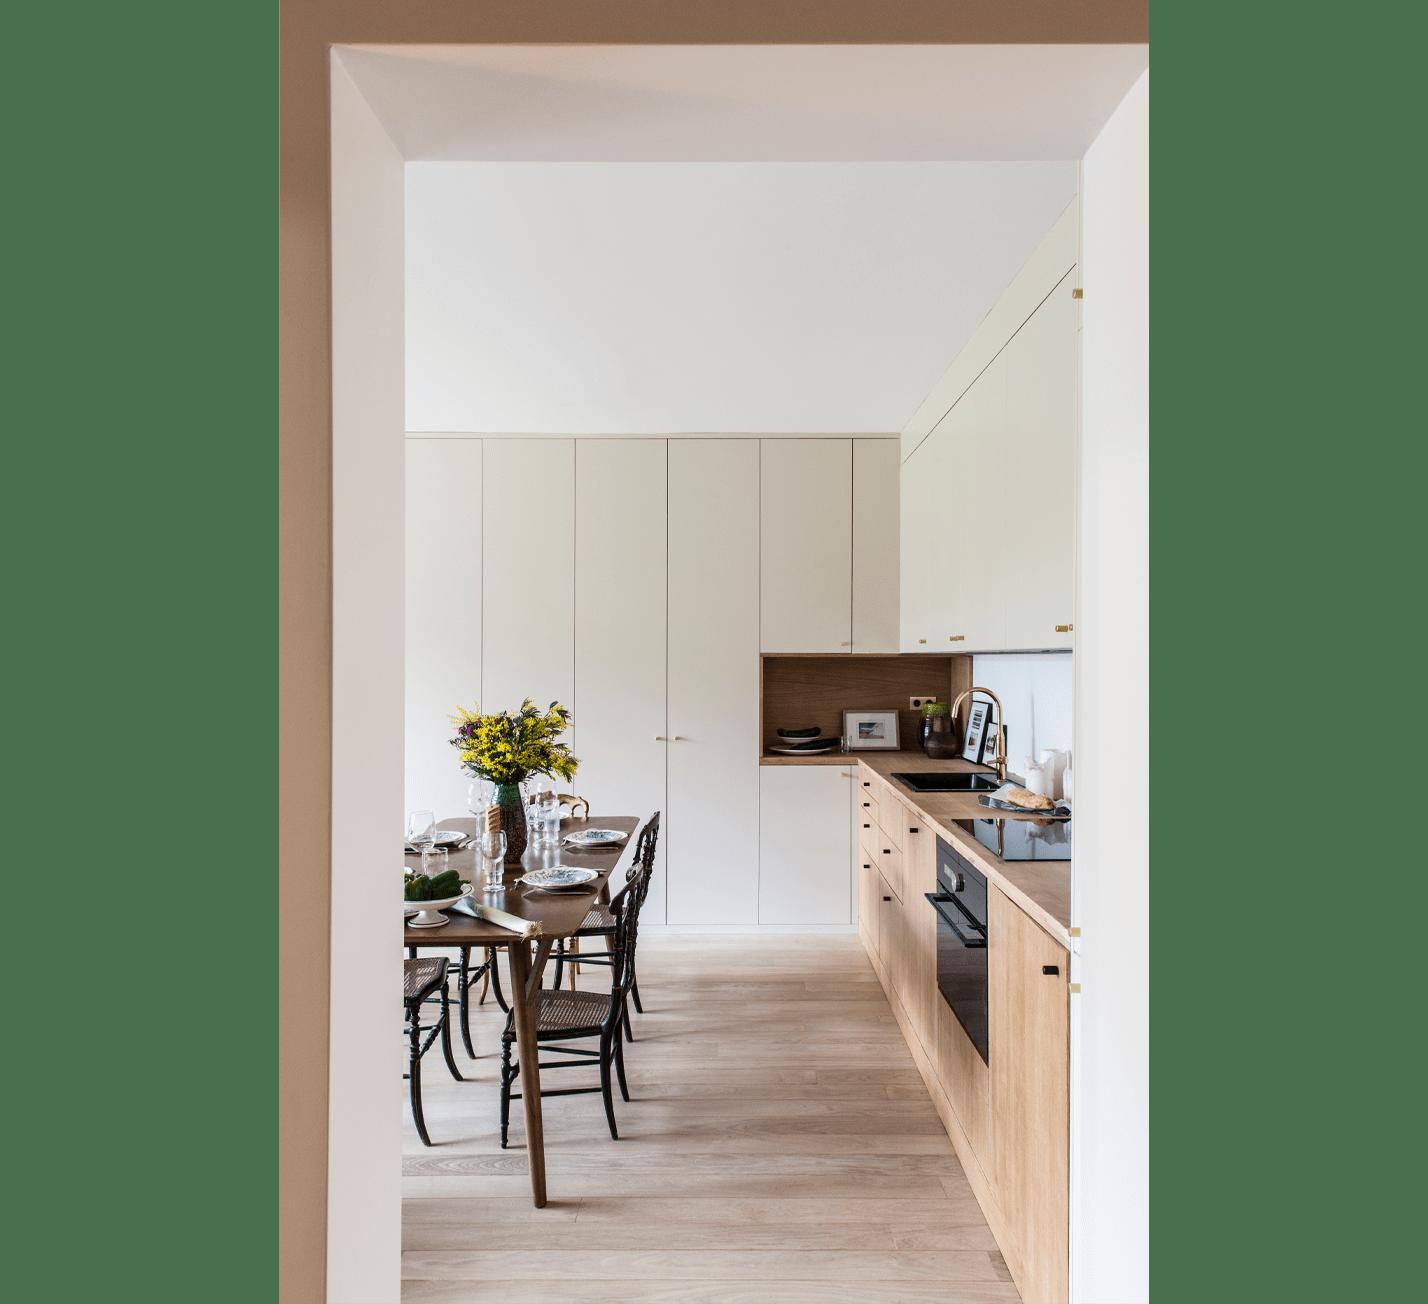 Projet-Albert-Atelier-Steve-Pauline-Borgia-Architecte-interieur-01-min-1